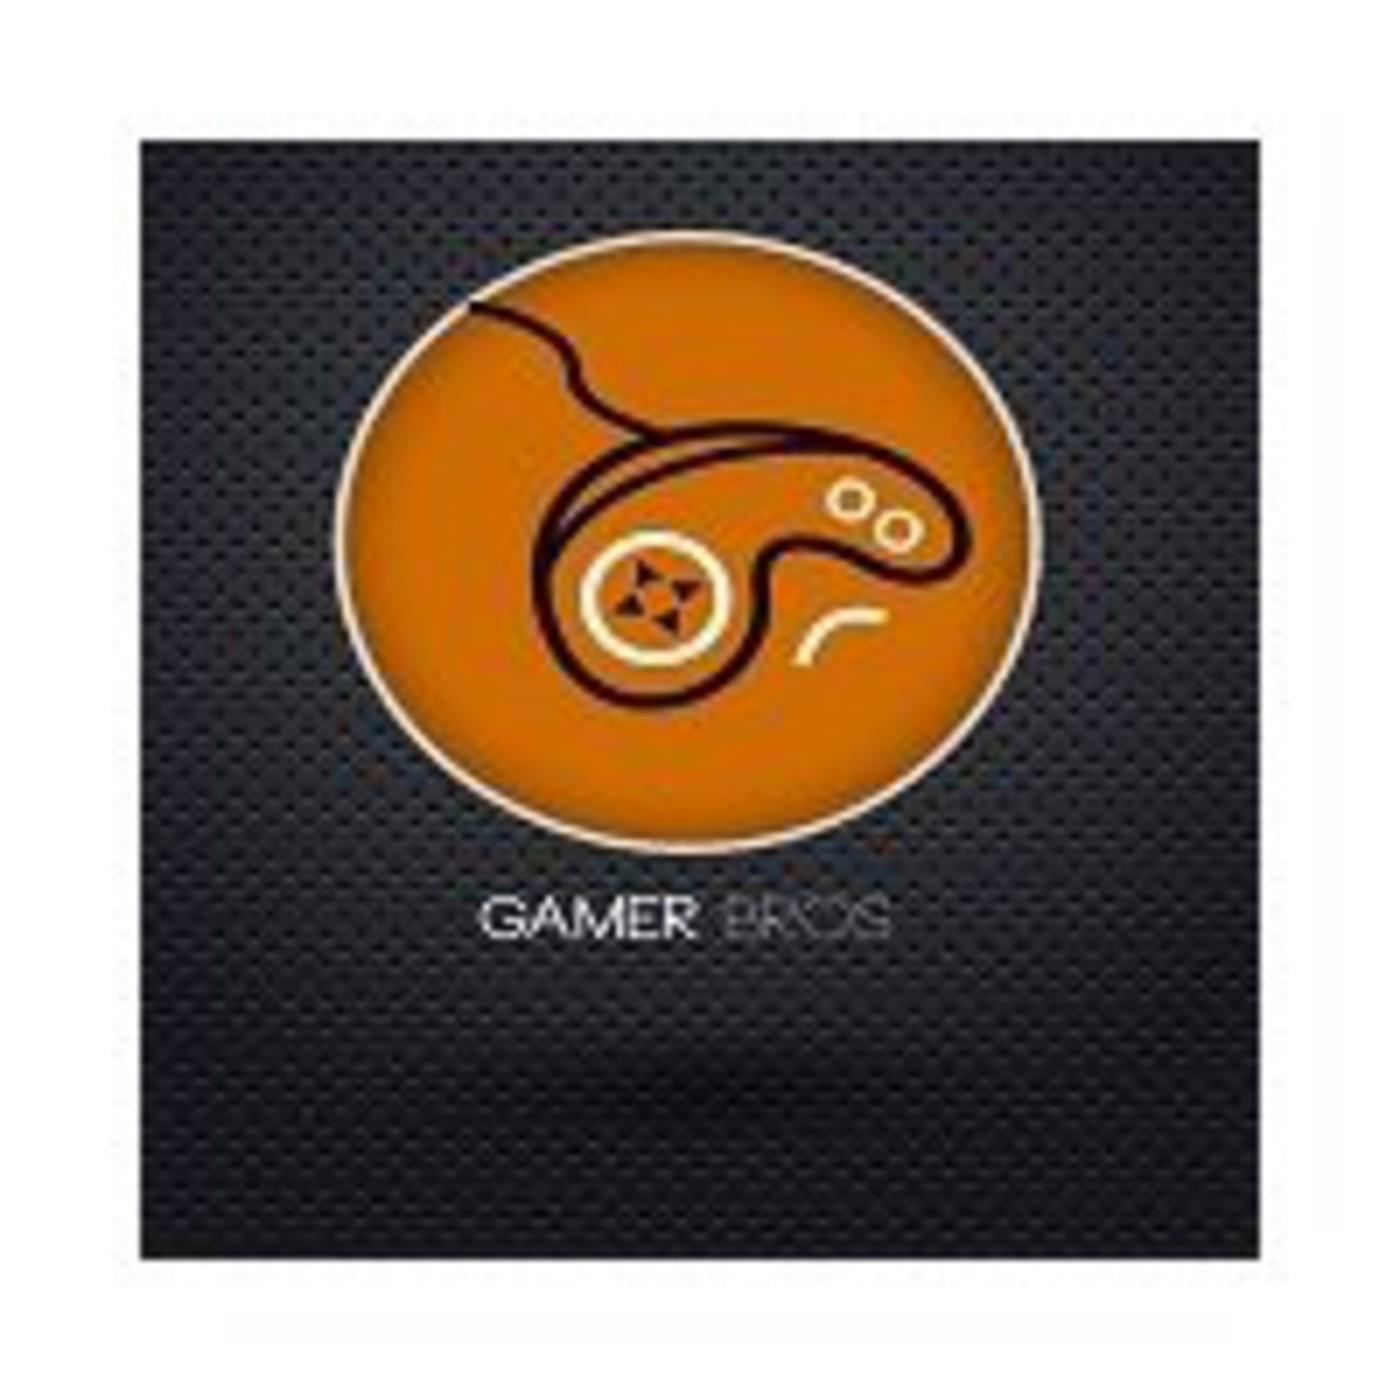 <![CDATA[Podcast GamersBros]]>